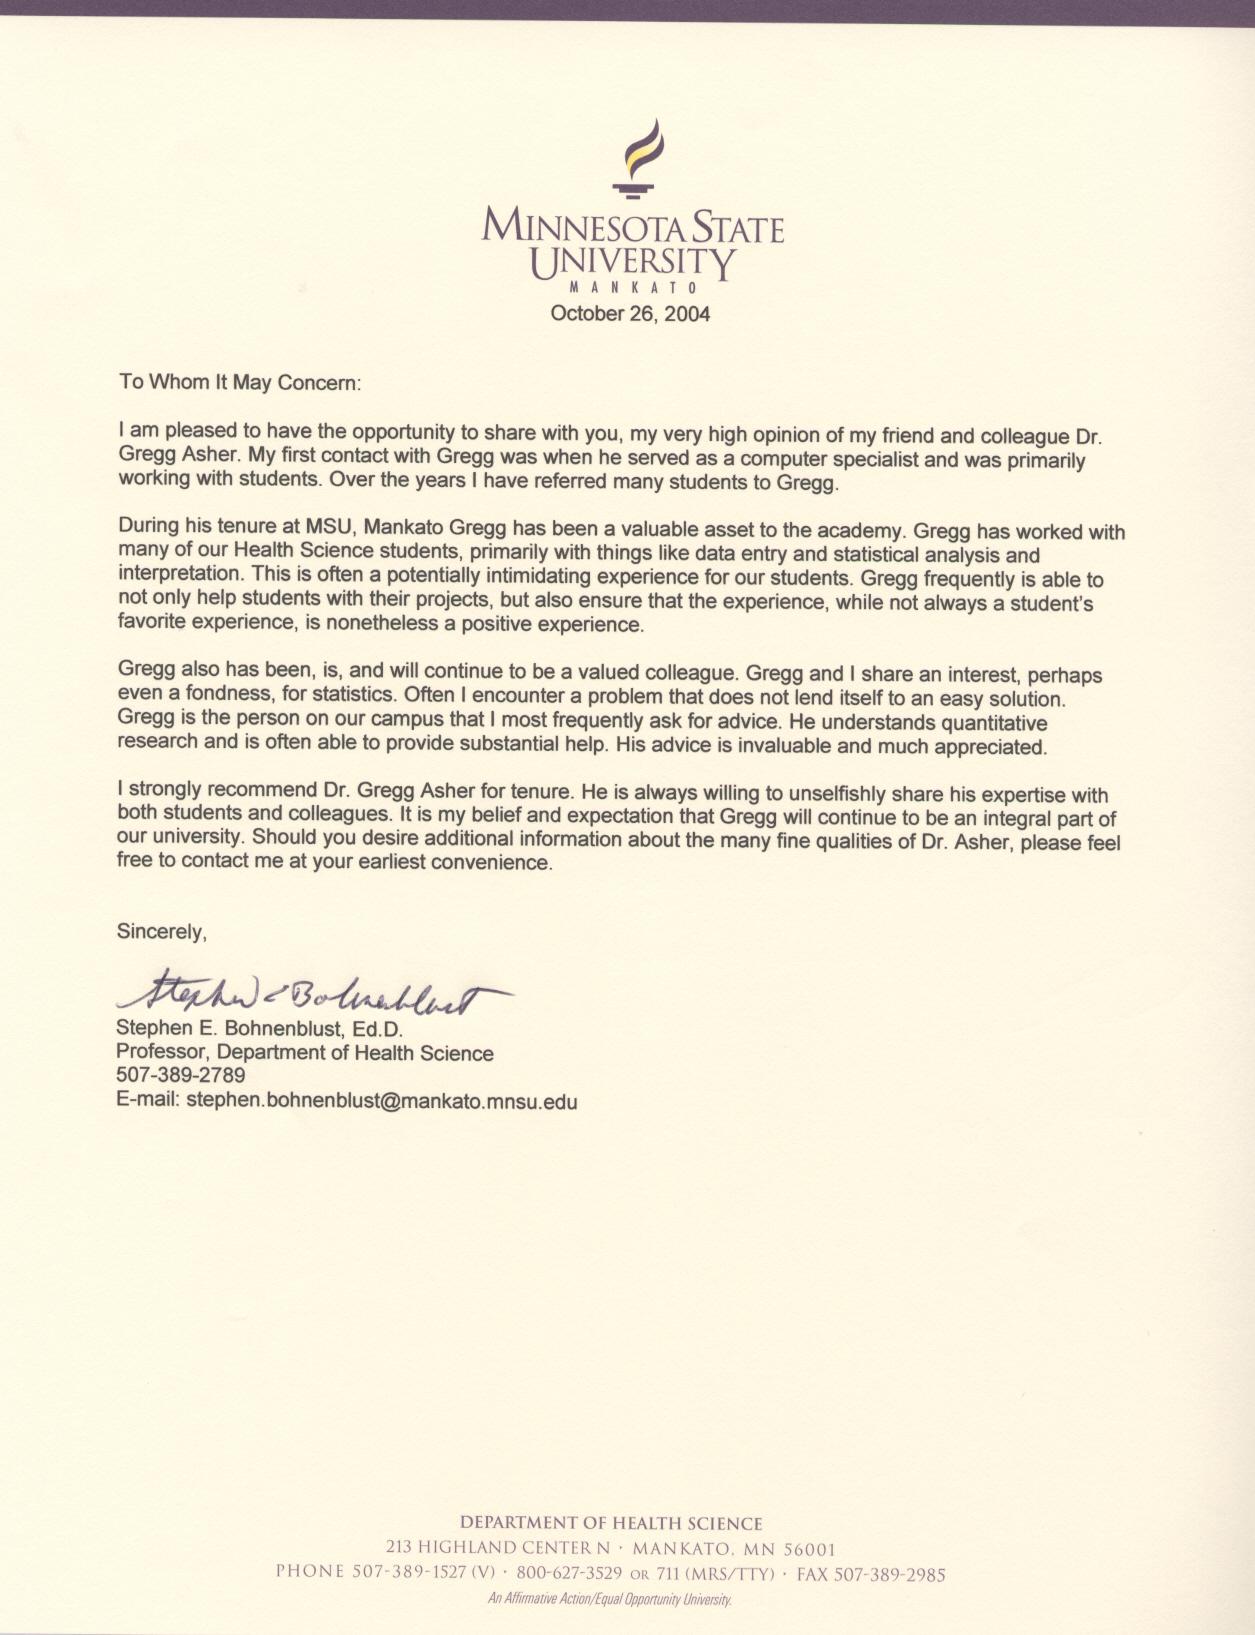 Sample letter of recommendation for college professor position tenure recommendation letter idealstalist spiritdancerdesigns Gallery